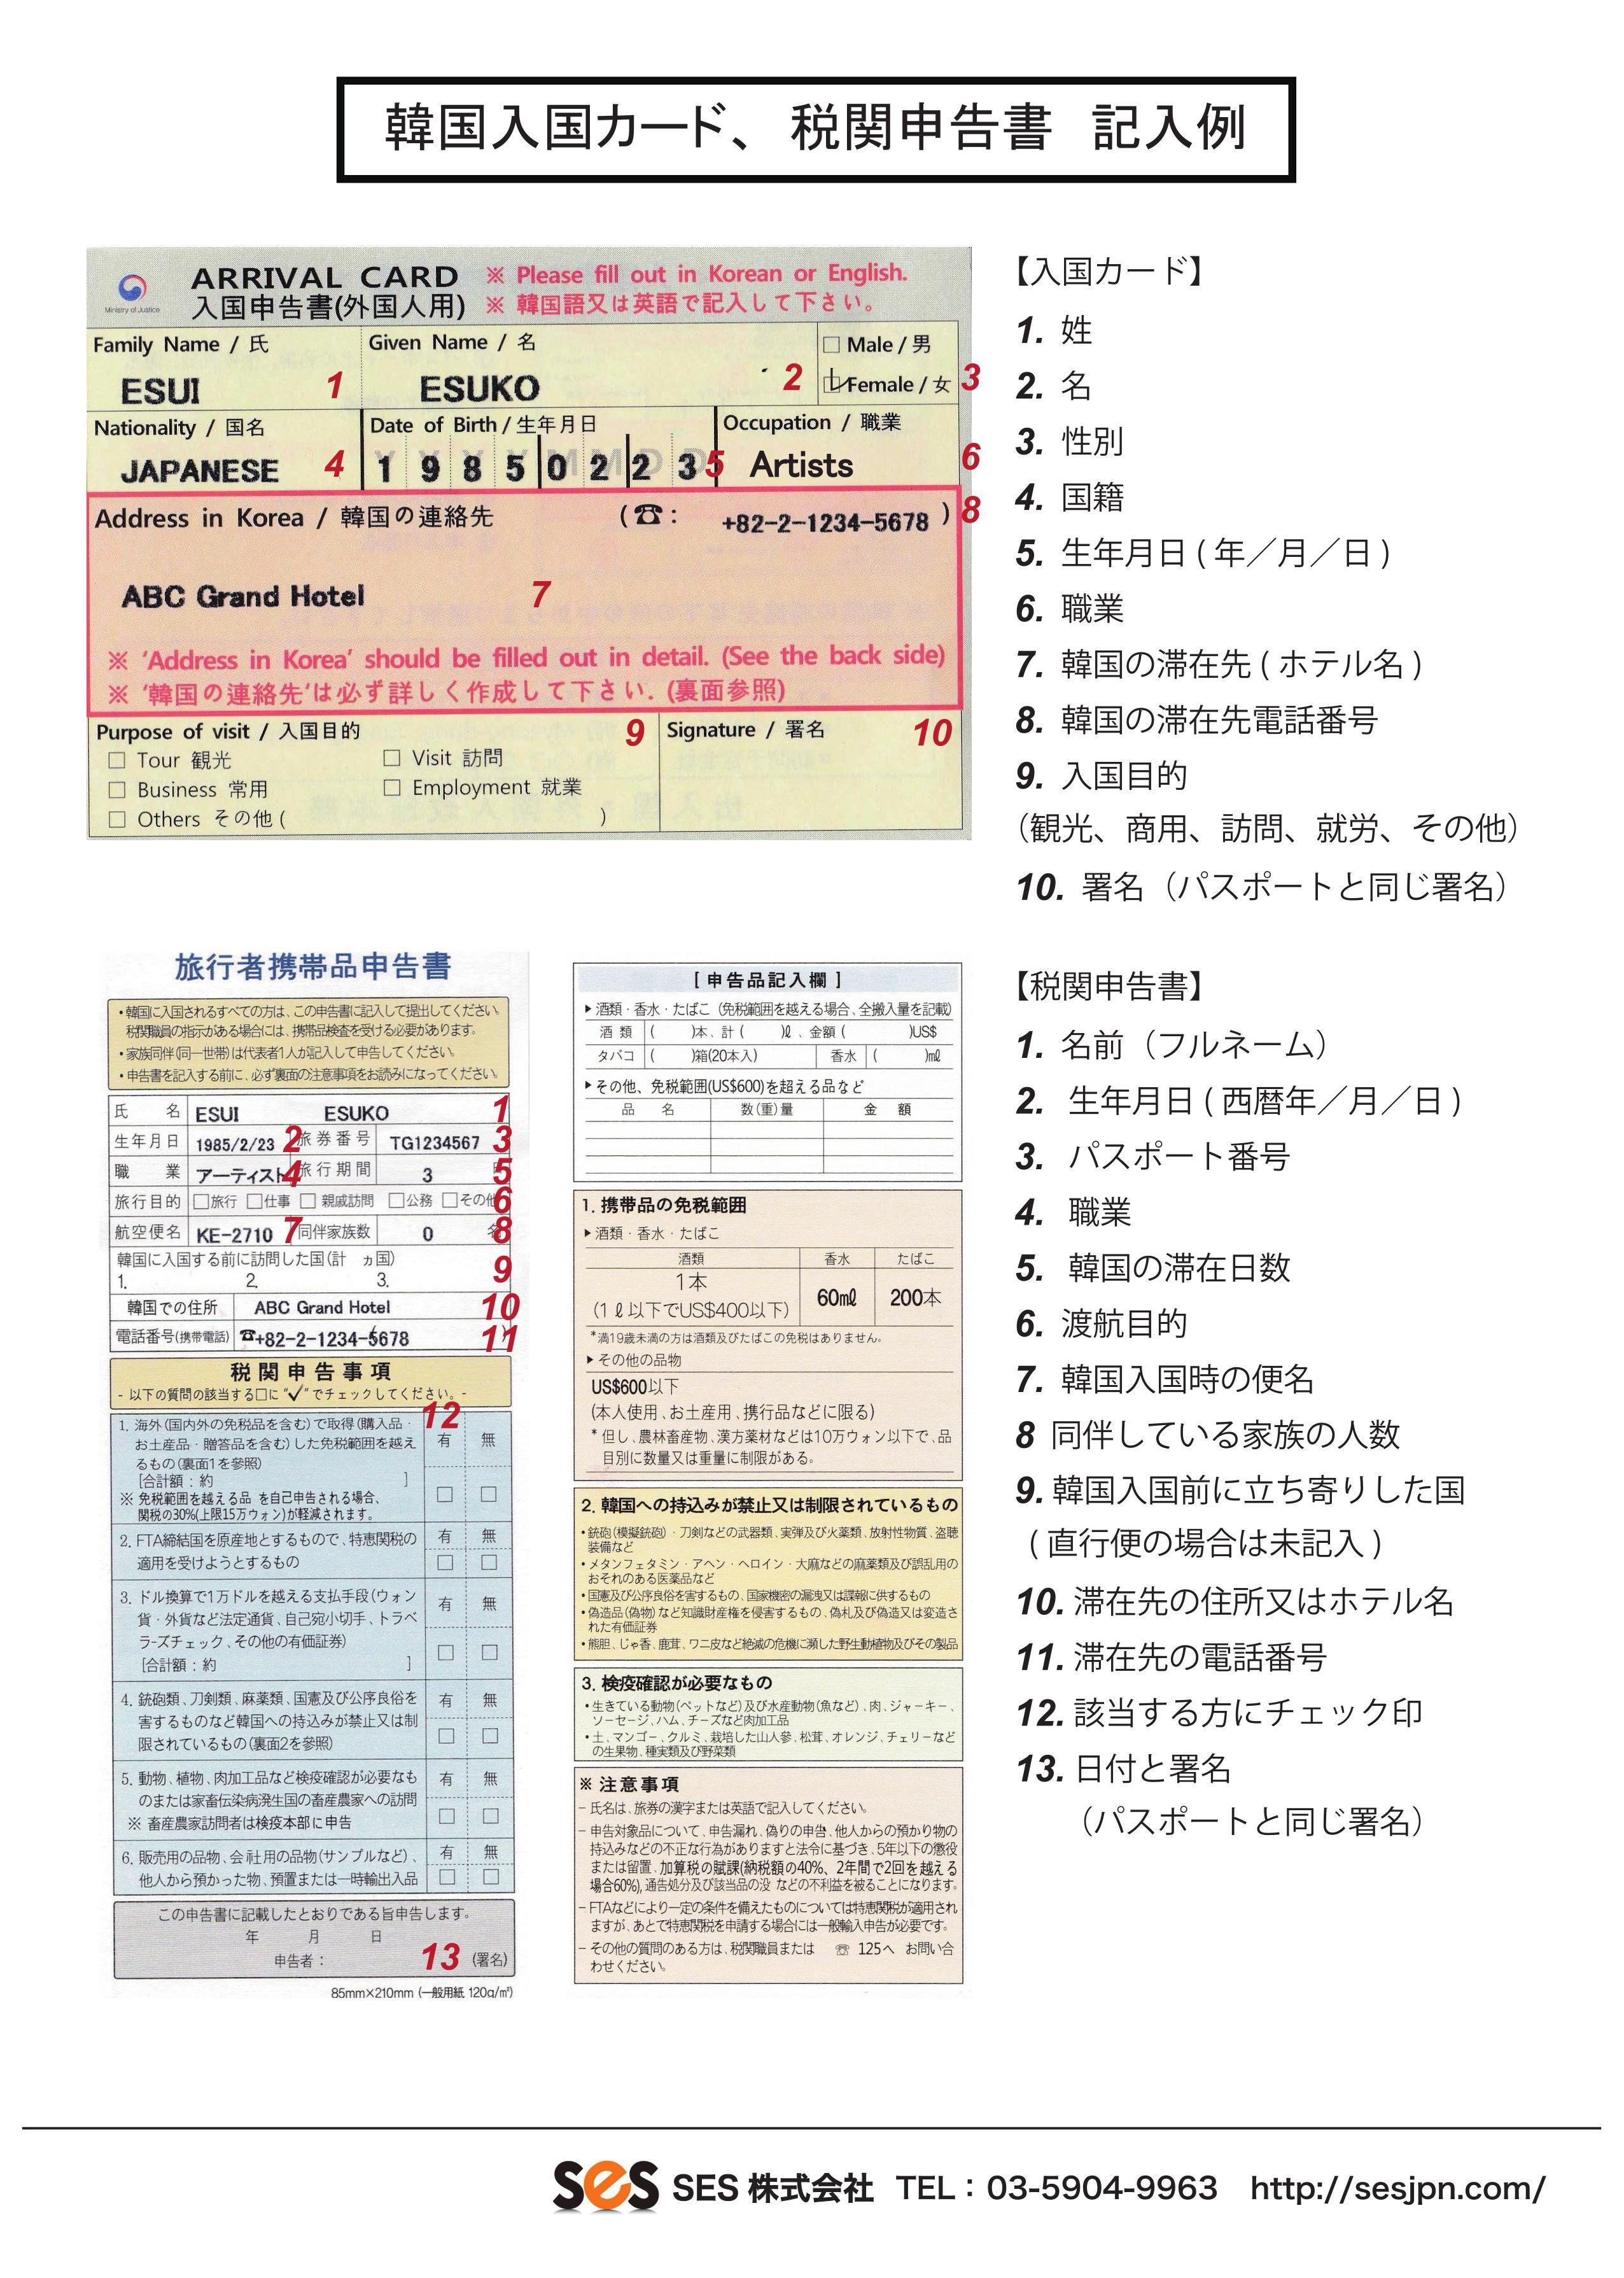 韓国入国カード・税関申告書